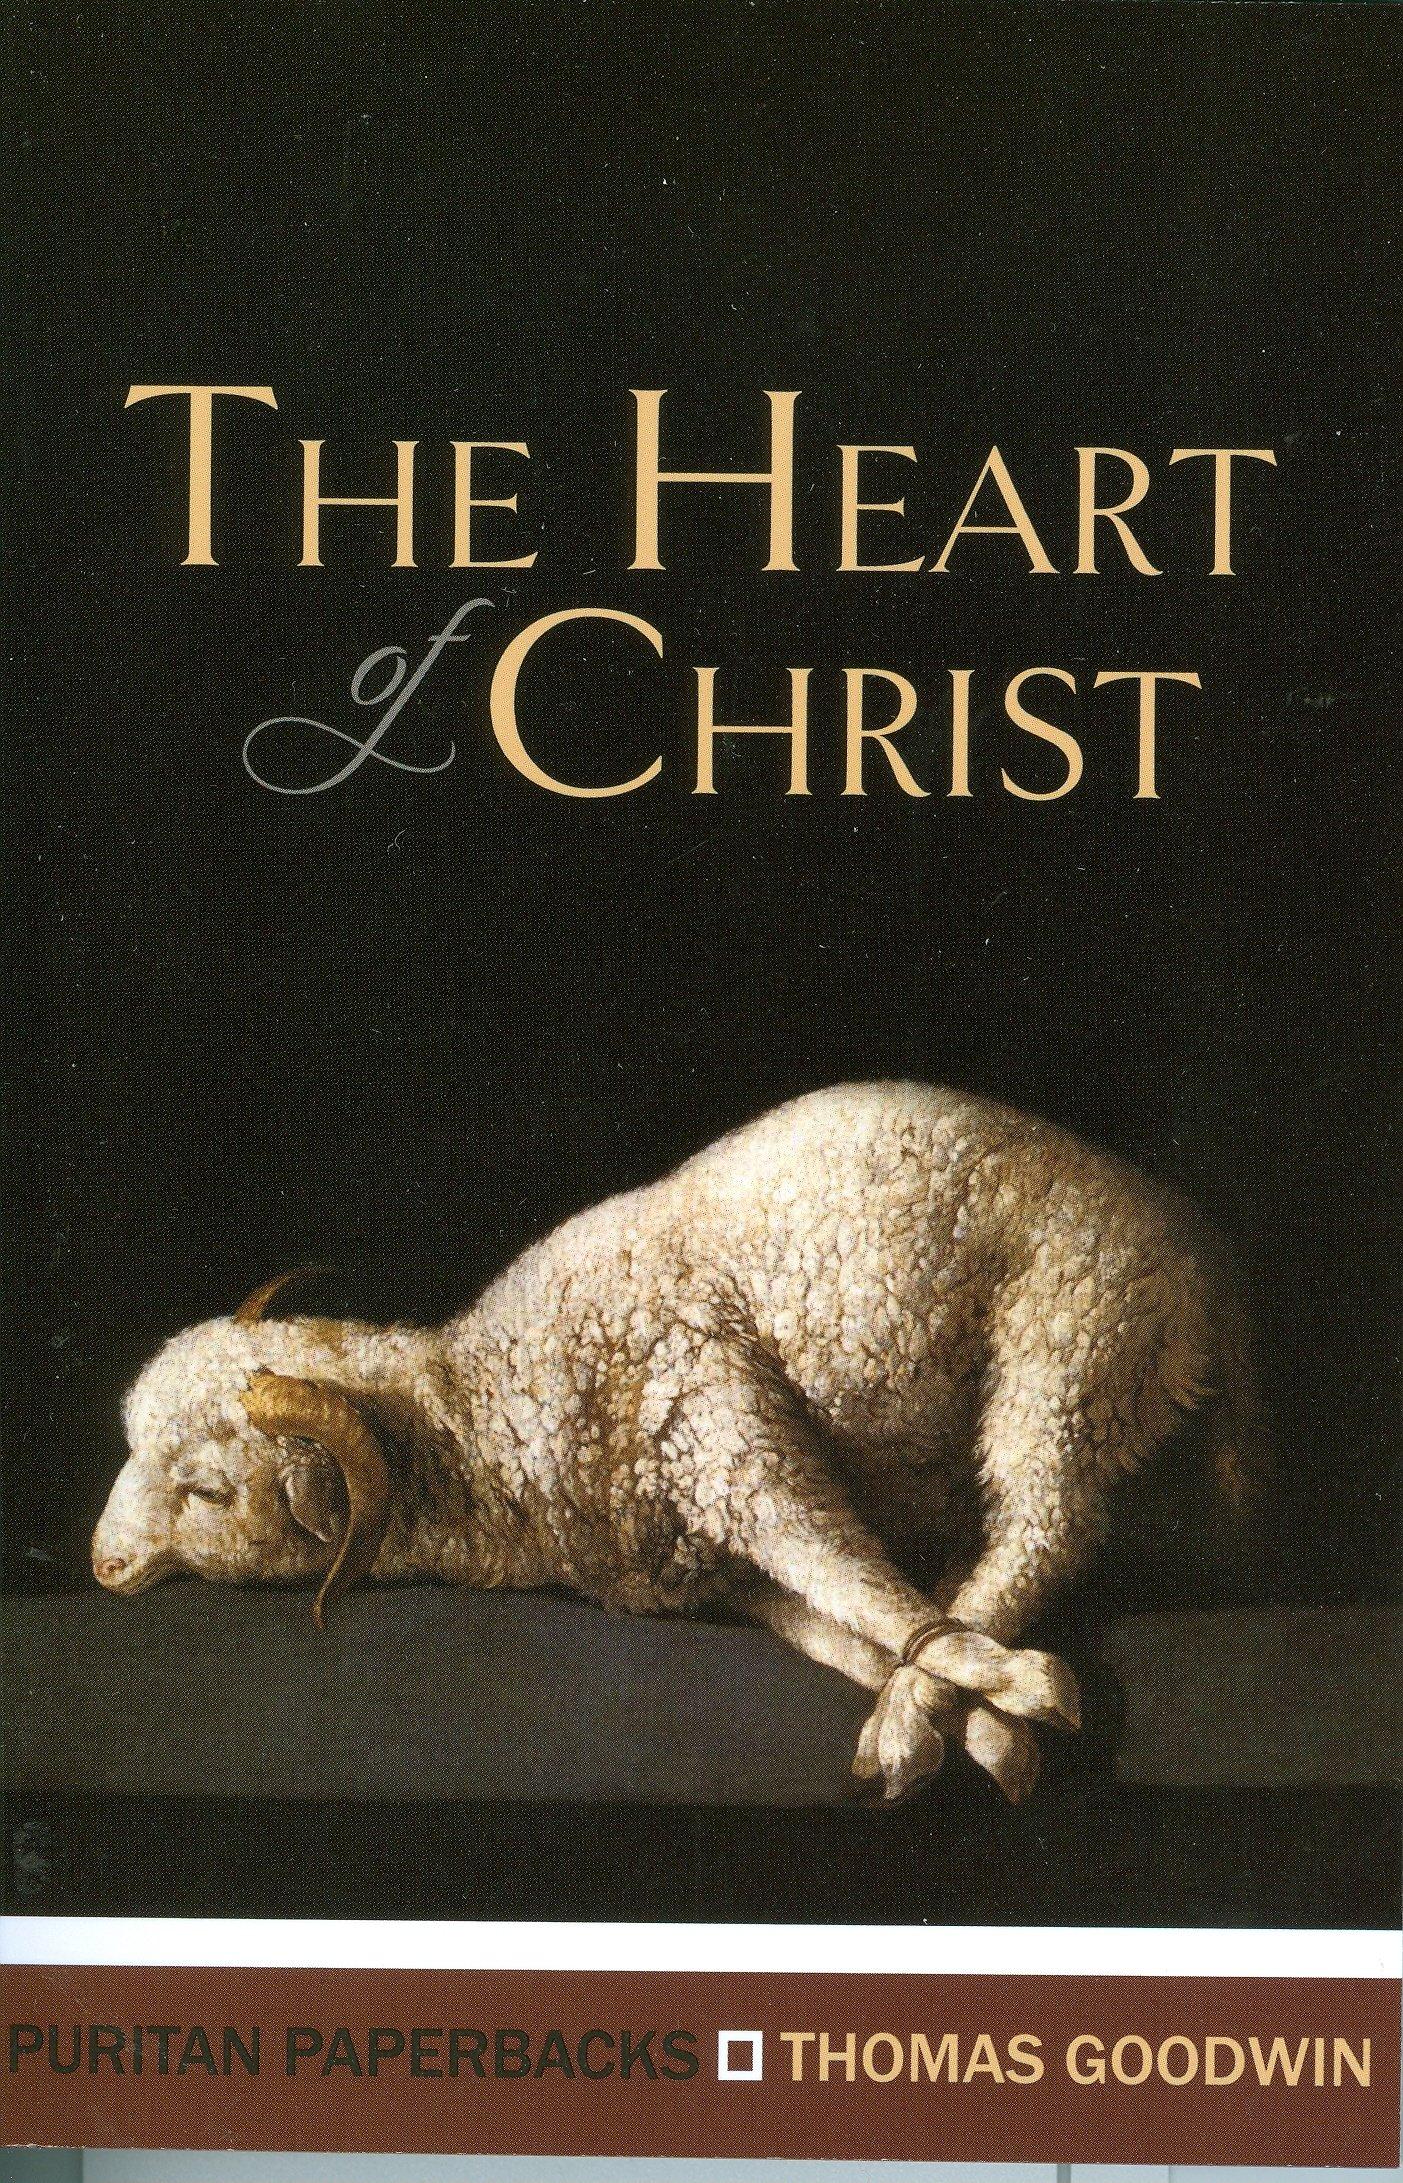 The Heart Of Christ (puritan Paperbacks): Thomas Goodwin, Michael Reeves:  9781848711464: Amazon: Books